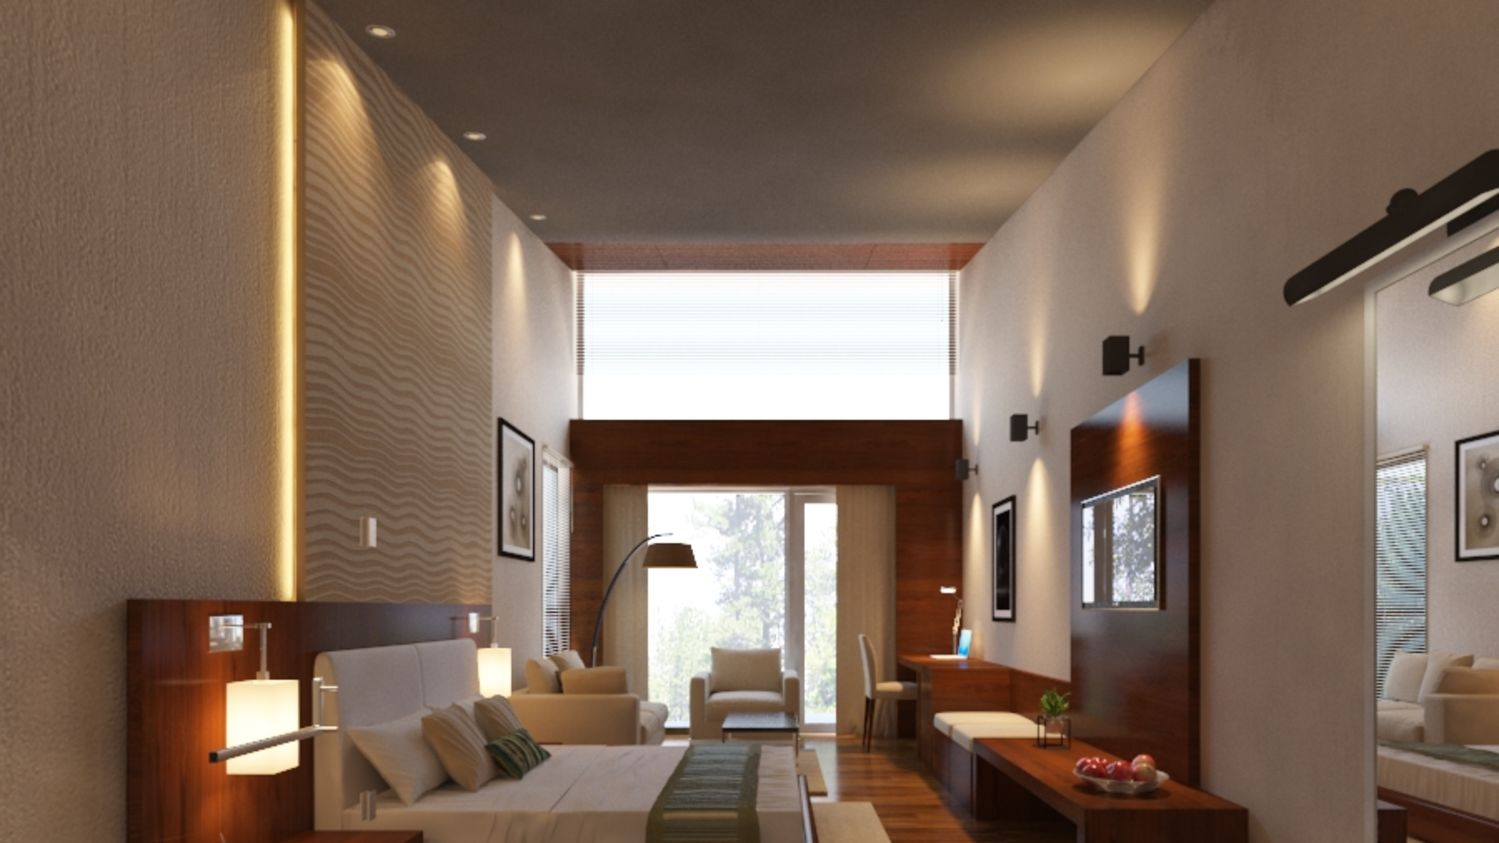 Deluxe Rooms in Bhimtal, Stay in Bhimtal, Rosefinch Sarovar Portico, Bhimtal-2